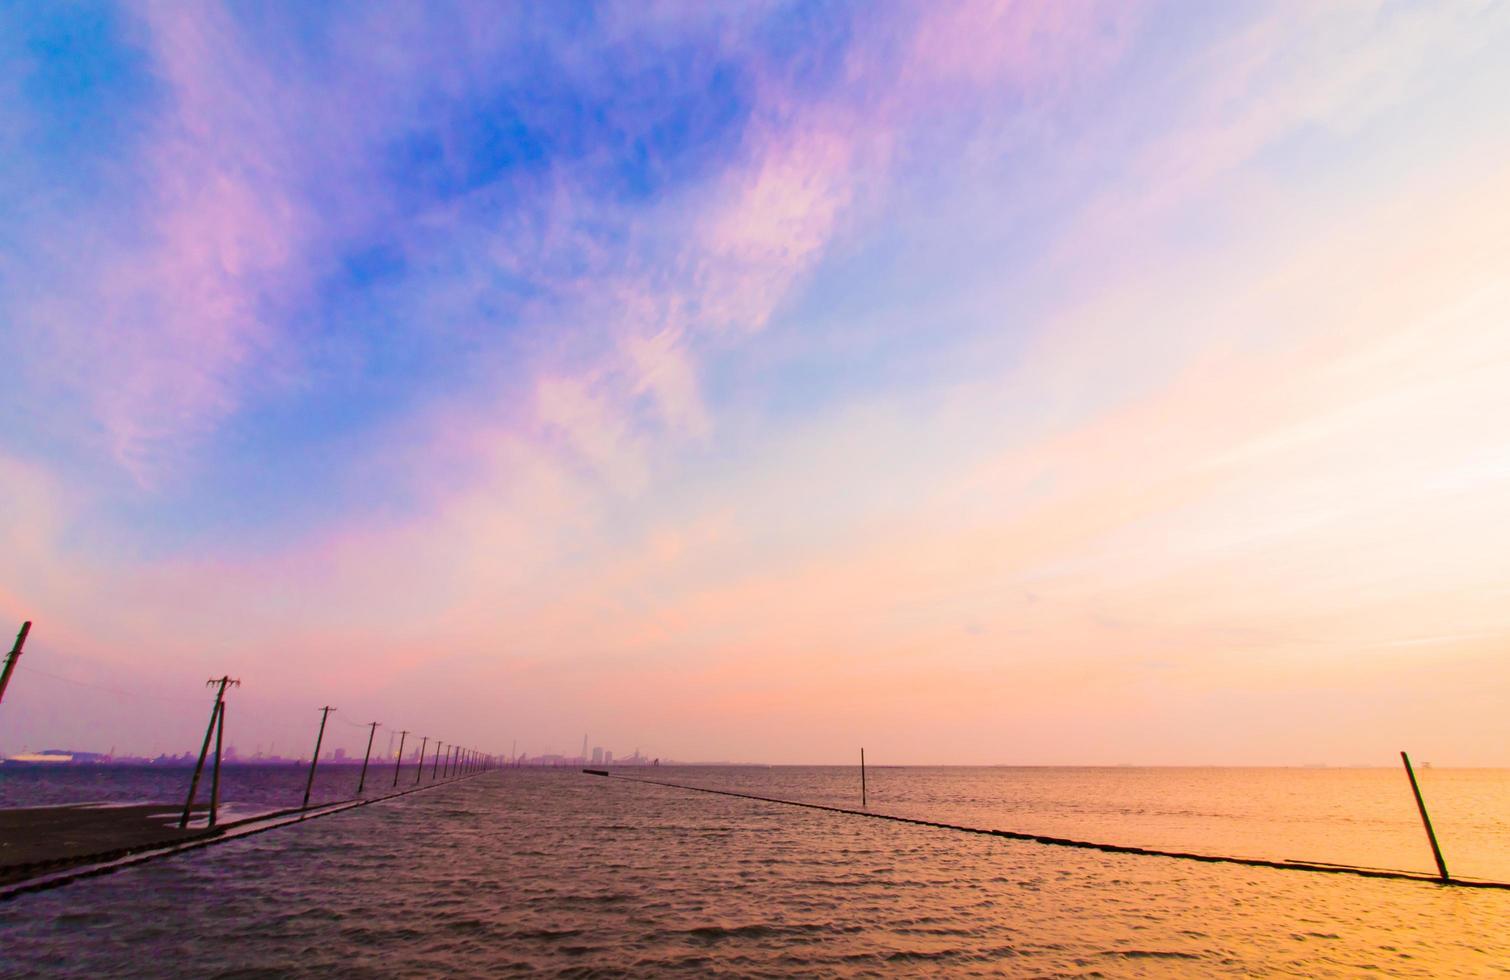 Tokyo bay with beautiful sunset sky photo